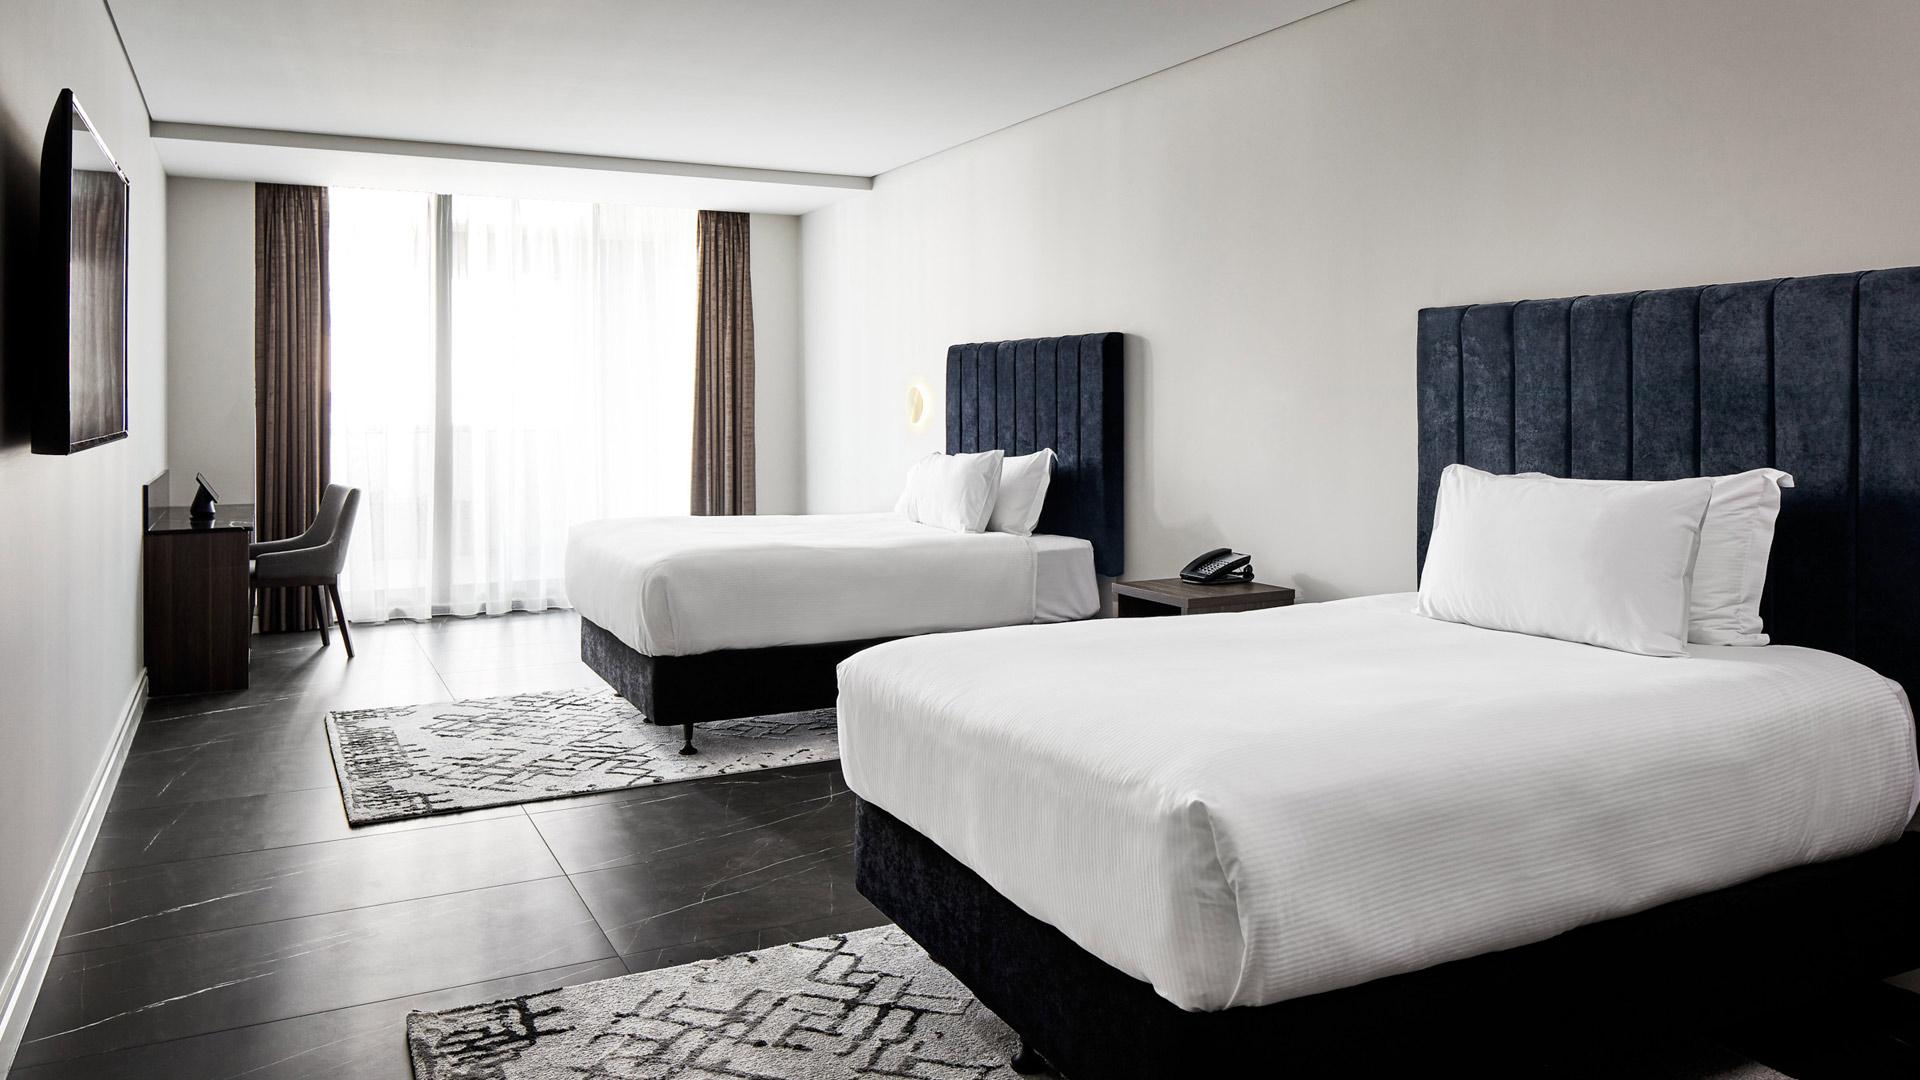 Conquest™ Crowne Plaza bedroom